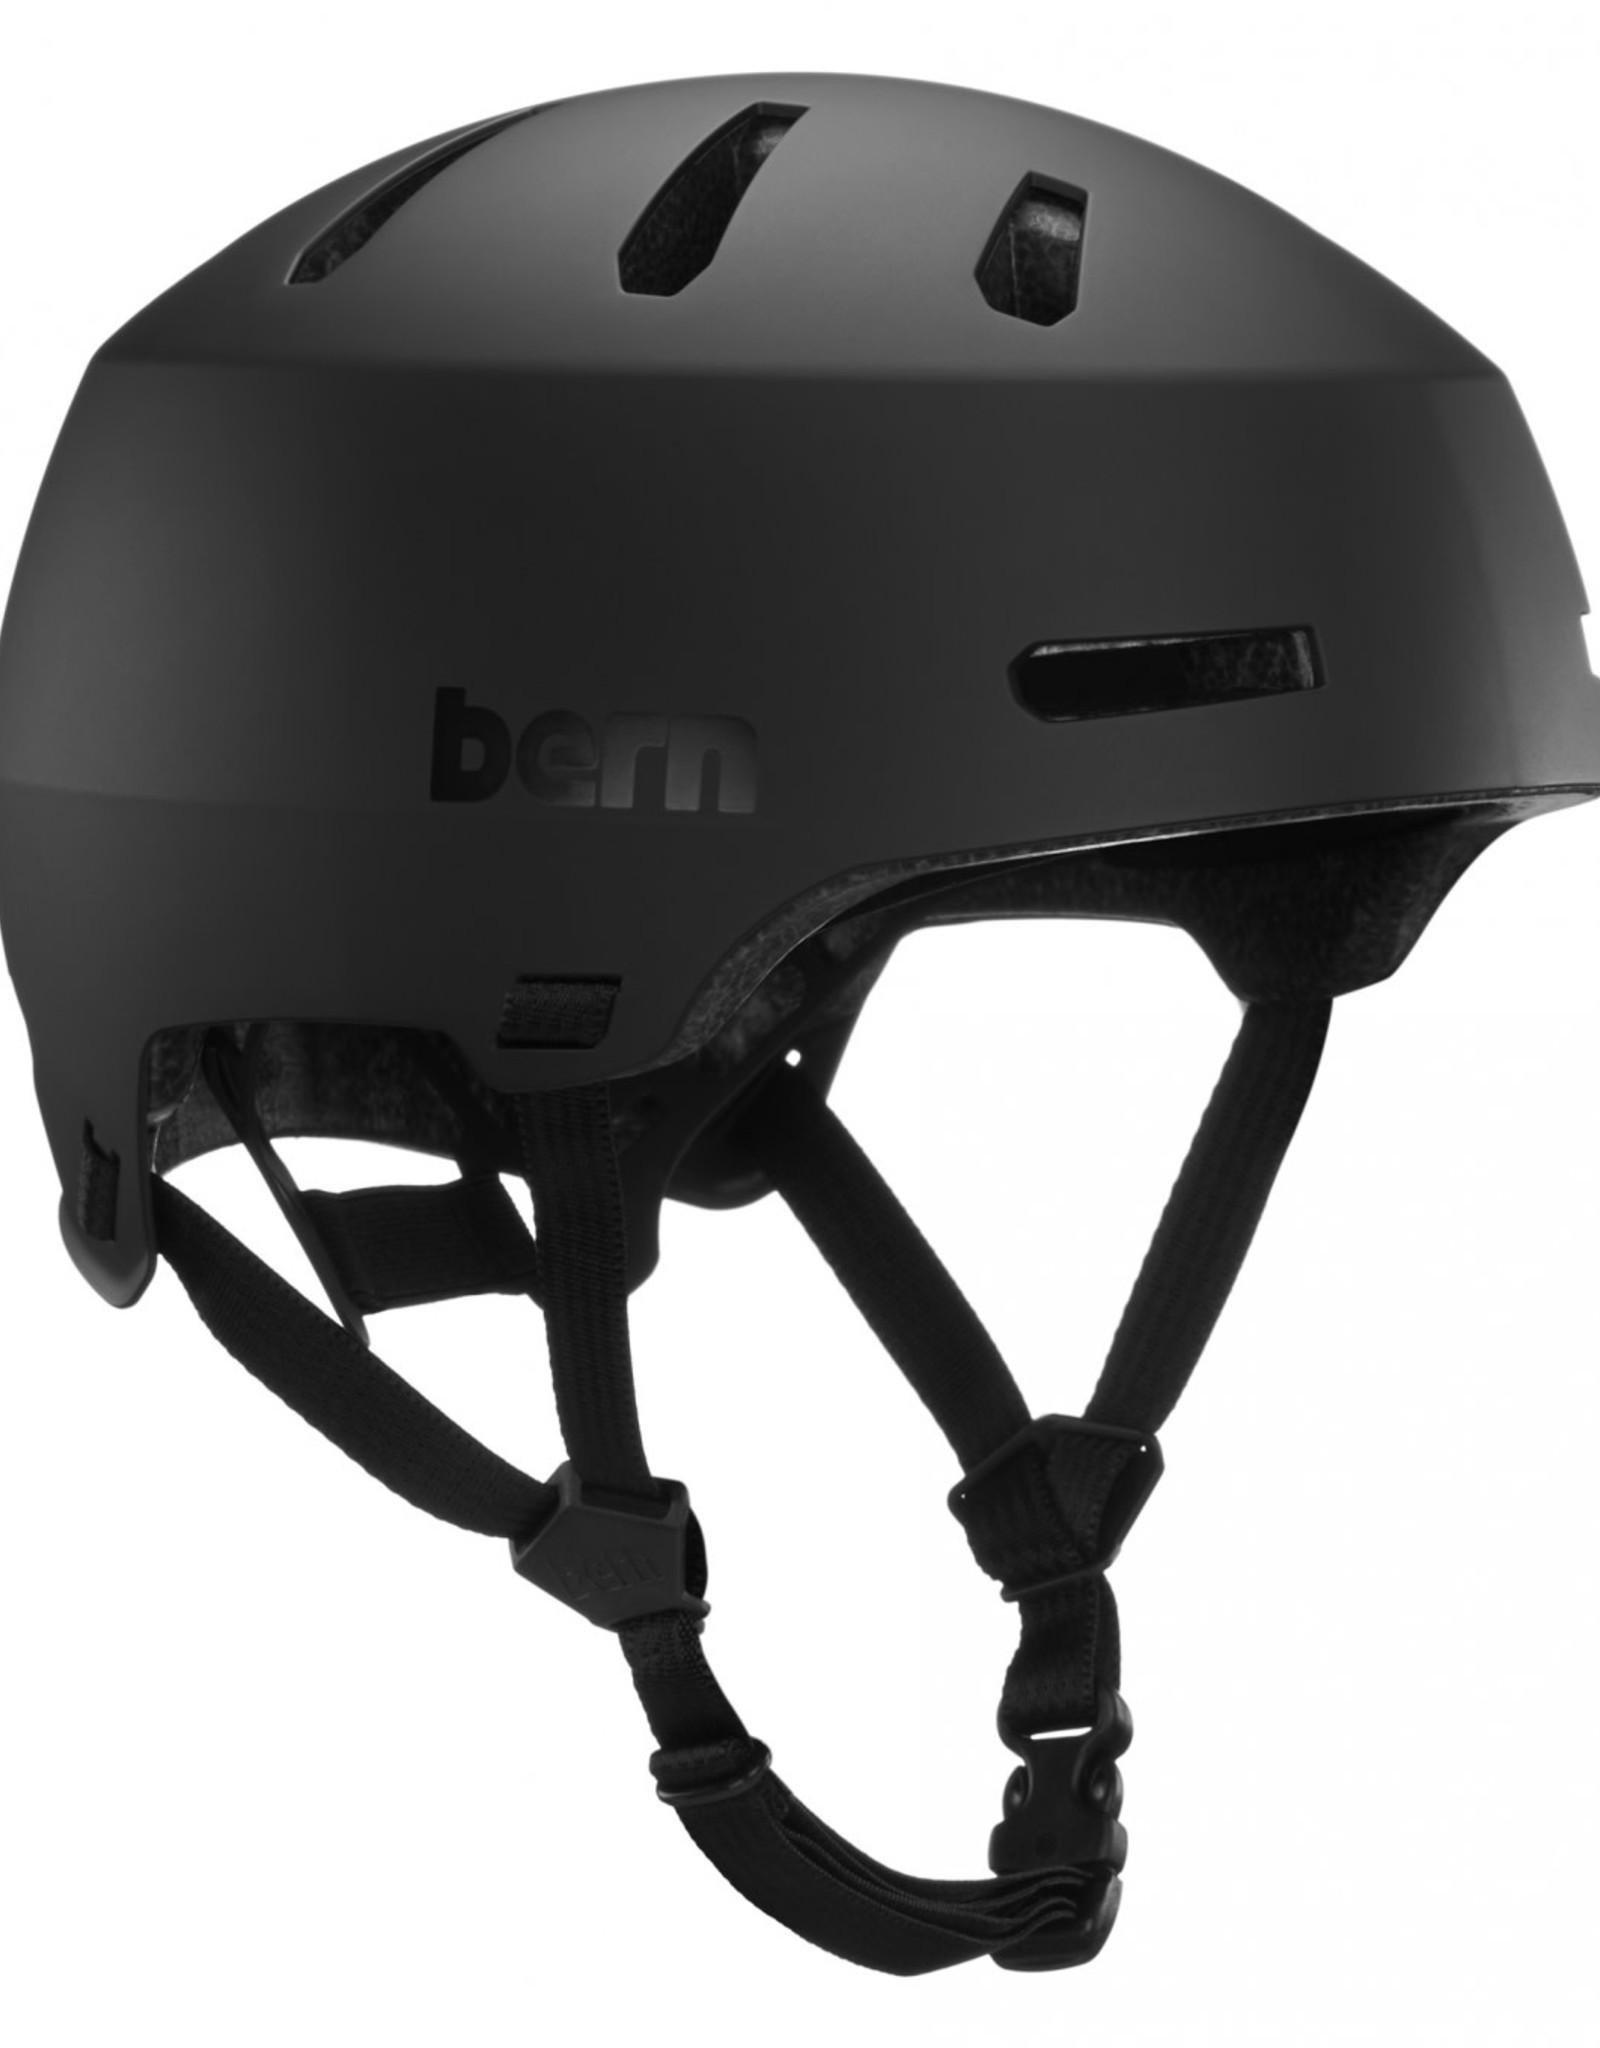 Bern Bern, Macon 2.0, Helmet, Matte Black, L, 59 - 62cm